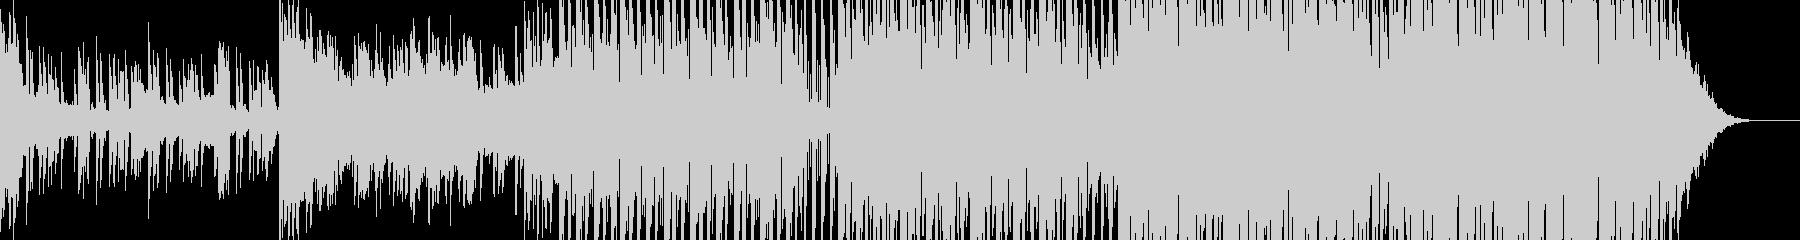 EDM  track 17の未再生の波形